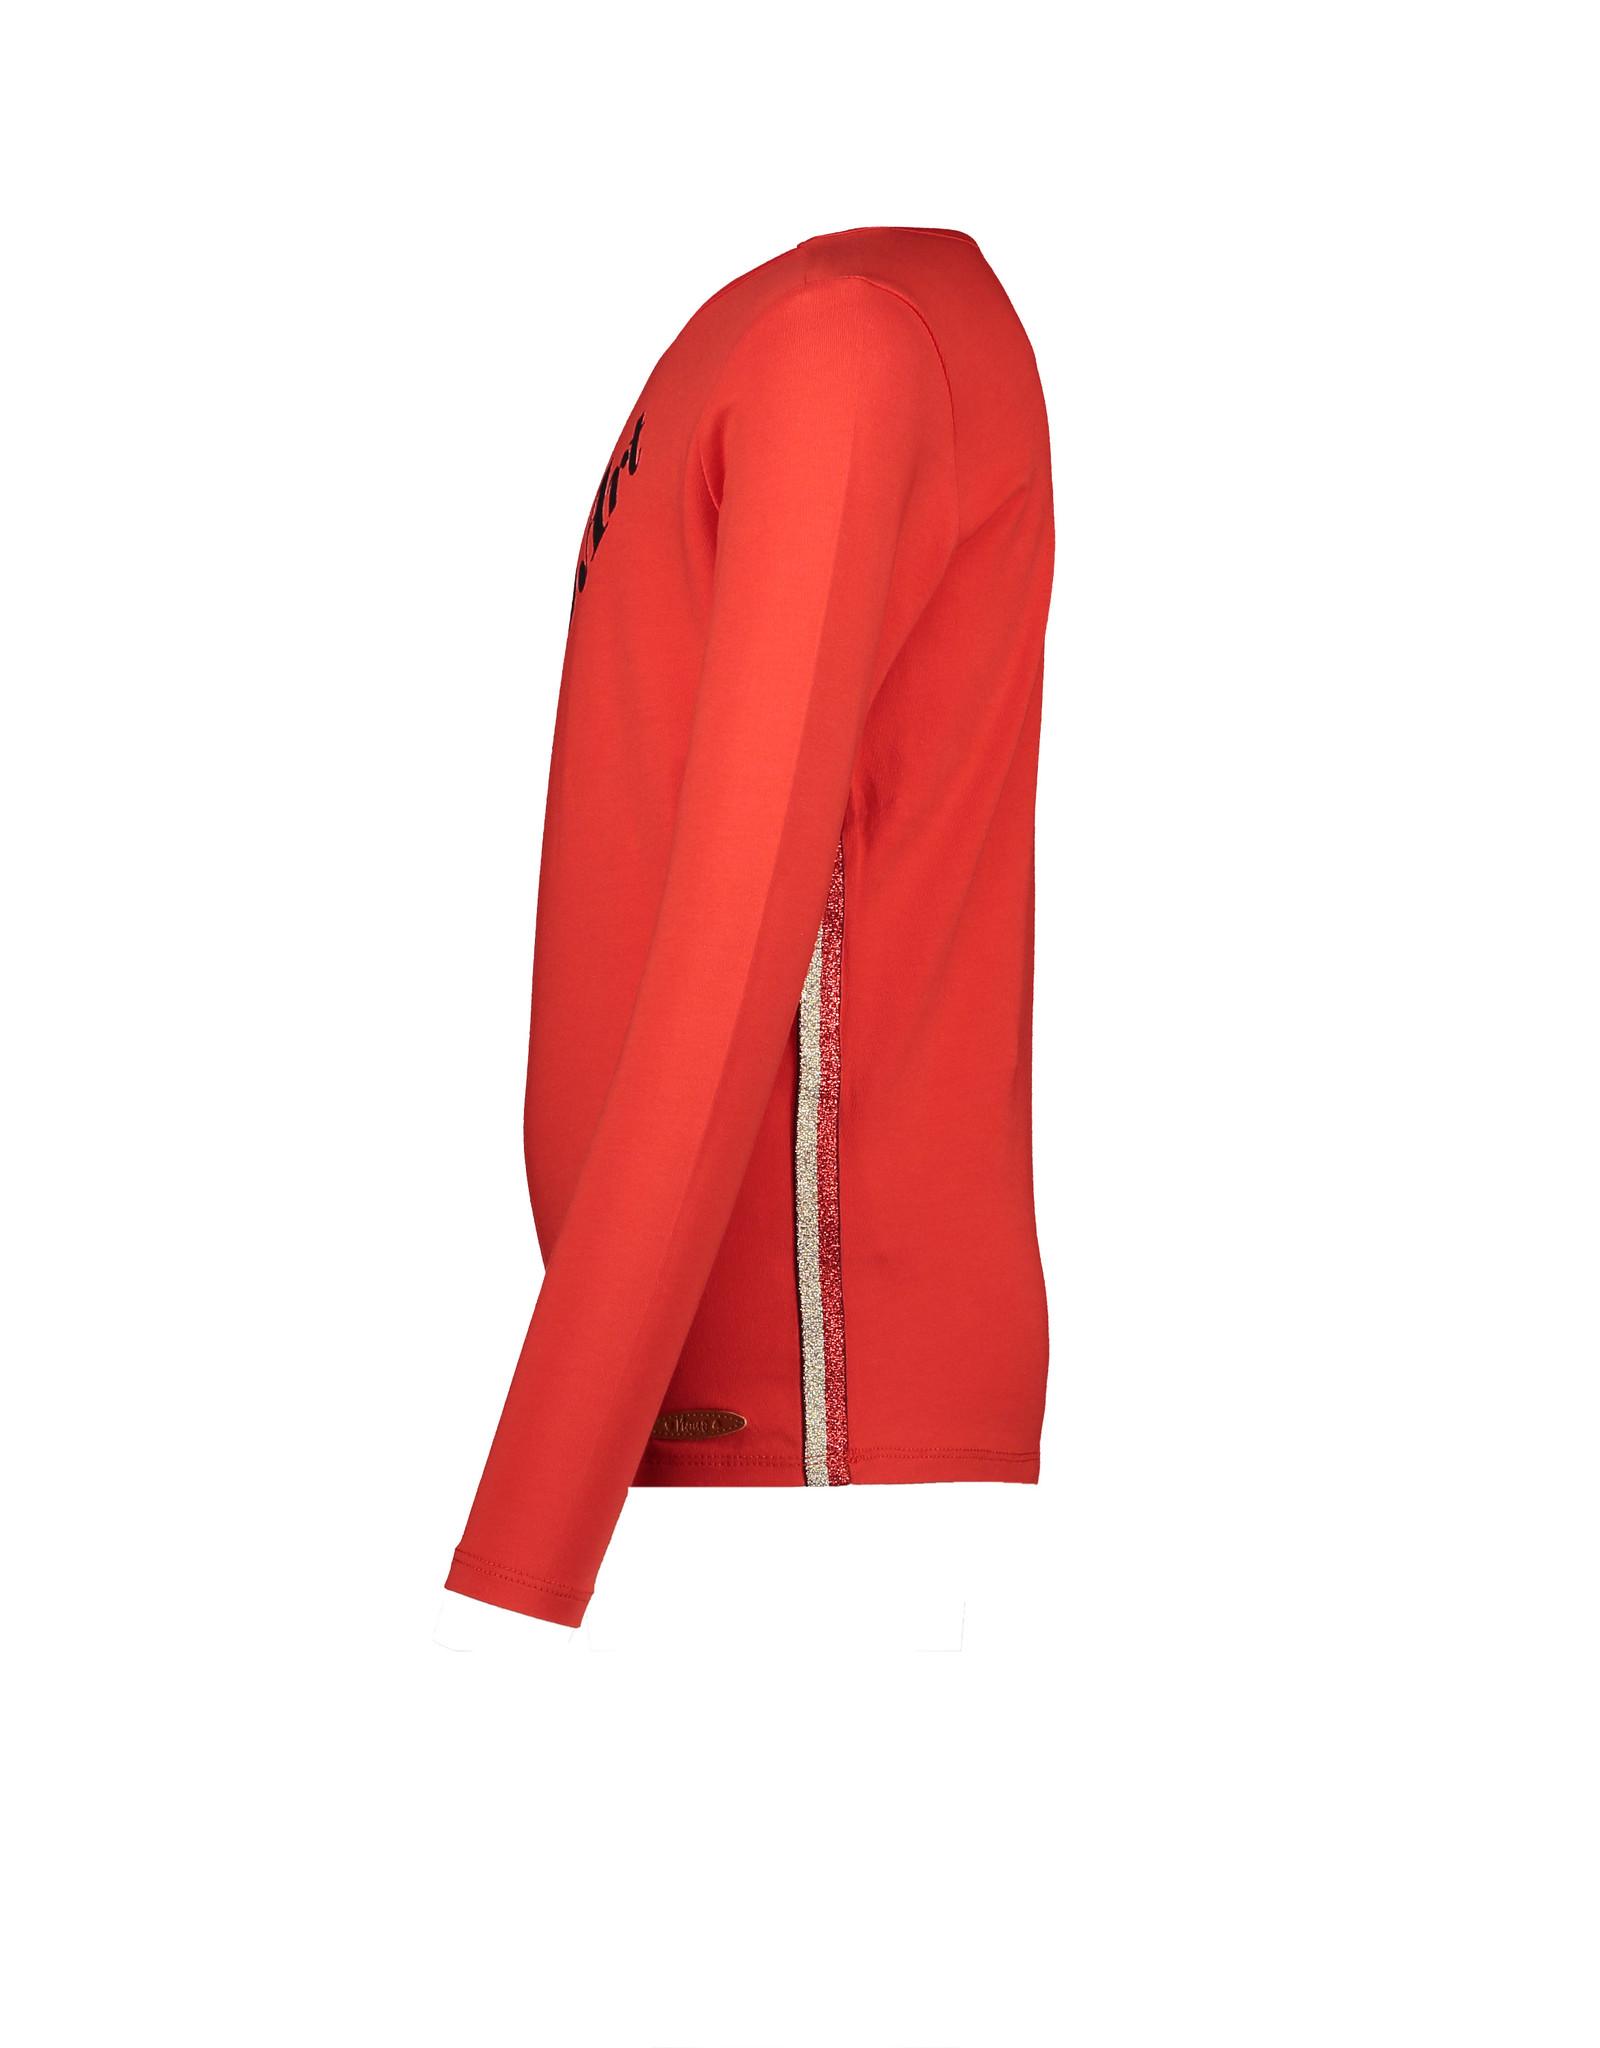 NONO NONO Kus Longsleeve T-shirt NONO Art CLASSIC RED